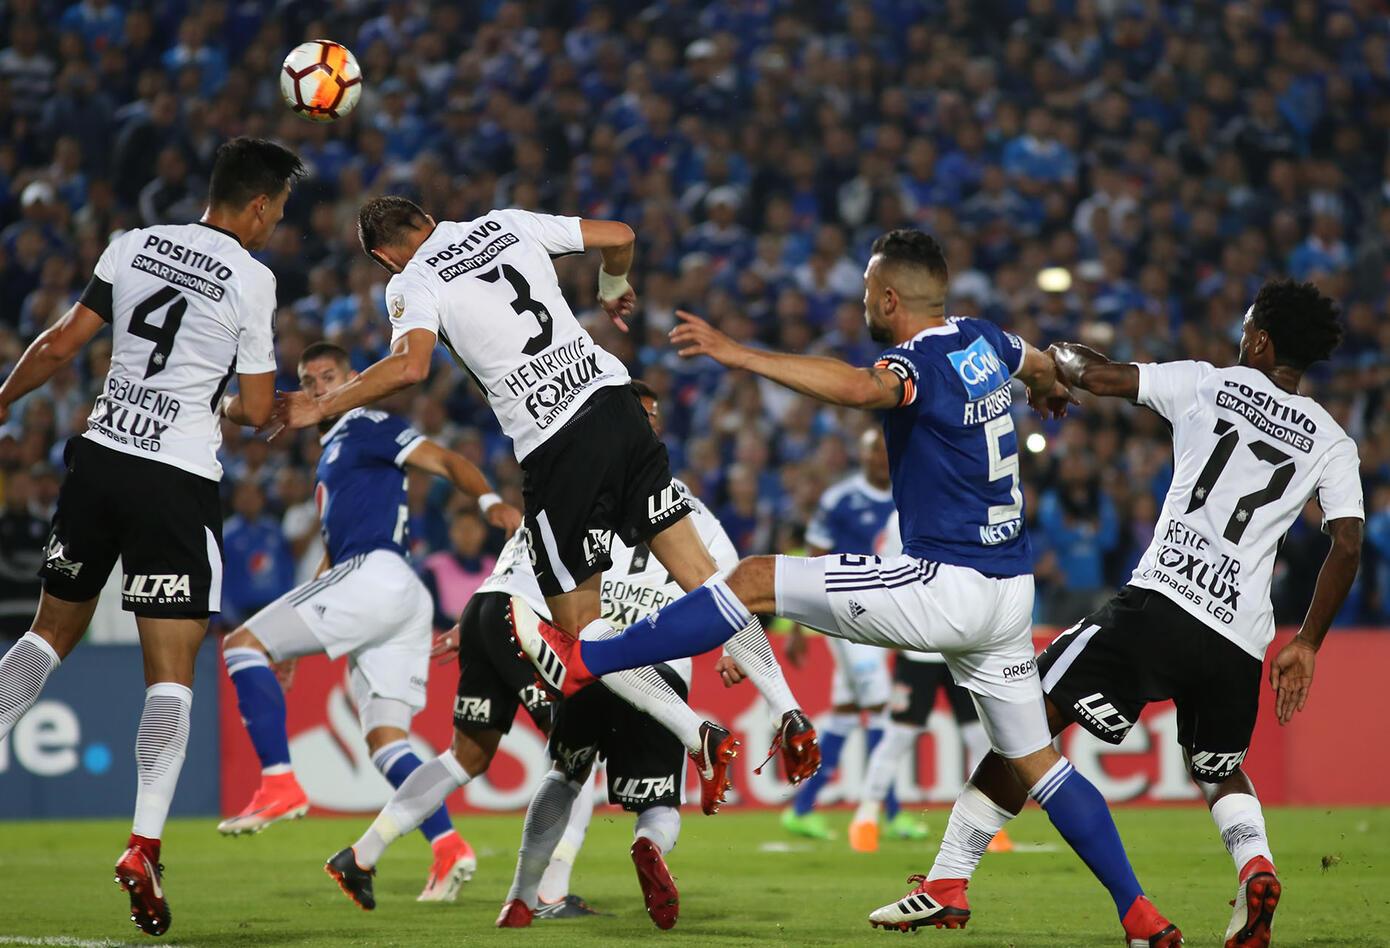 Millonarios Vs. Corinthians